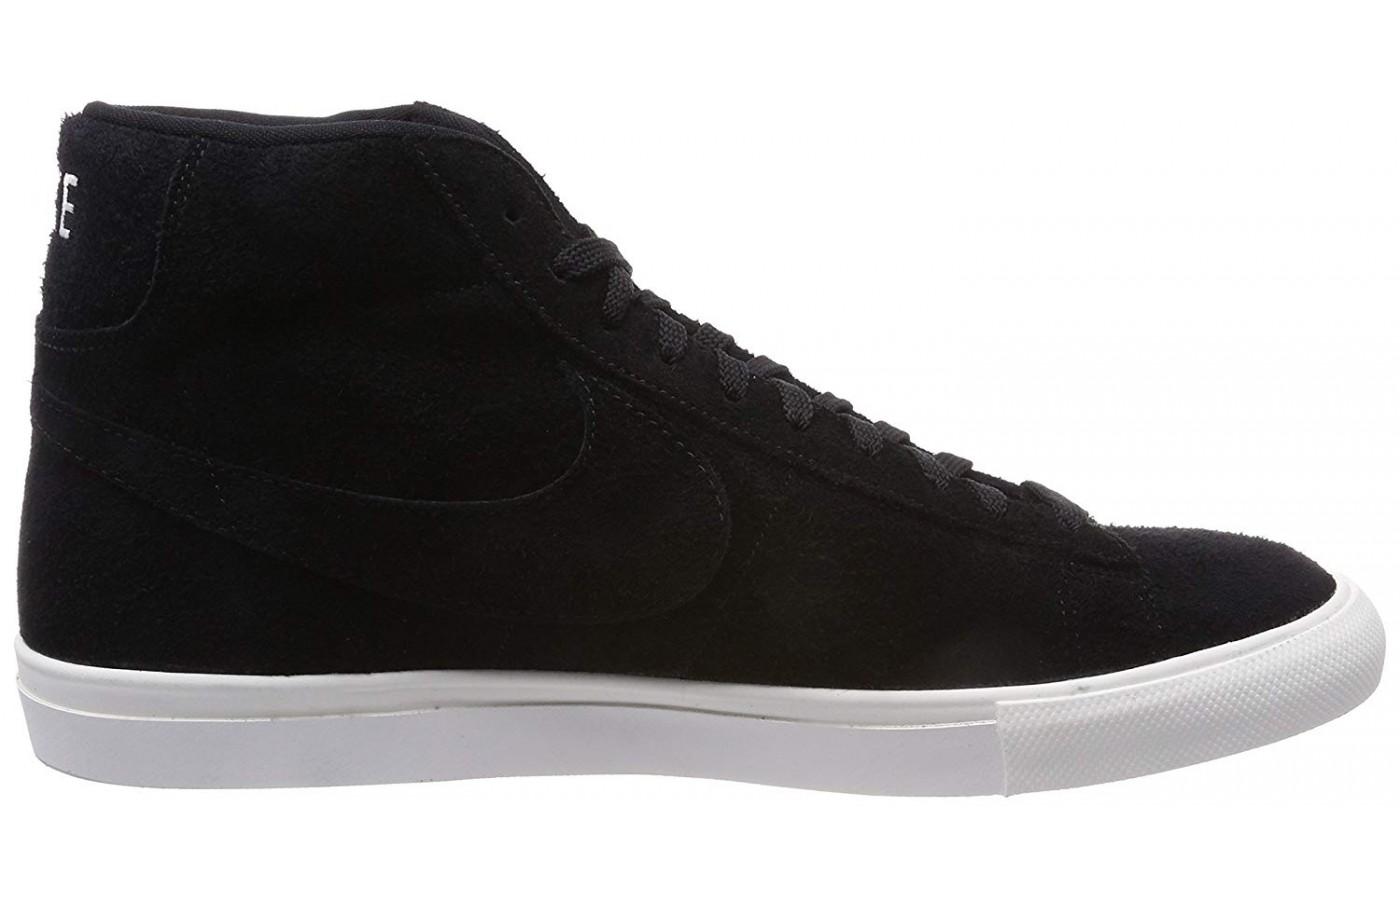 Nike Blazer Mid Outsole